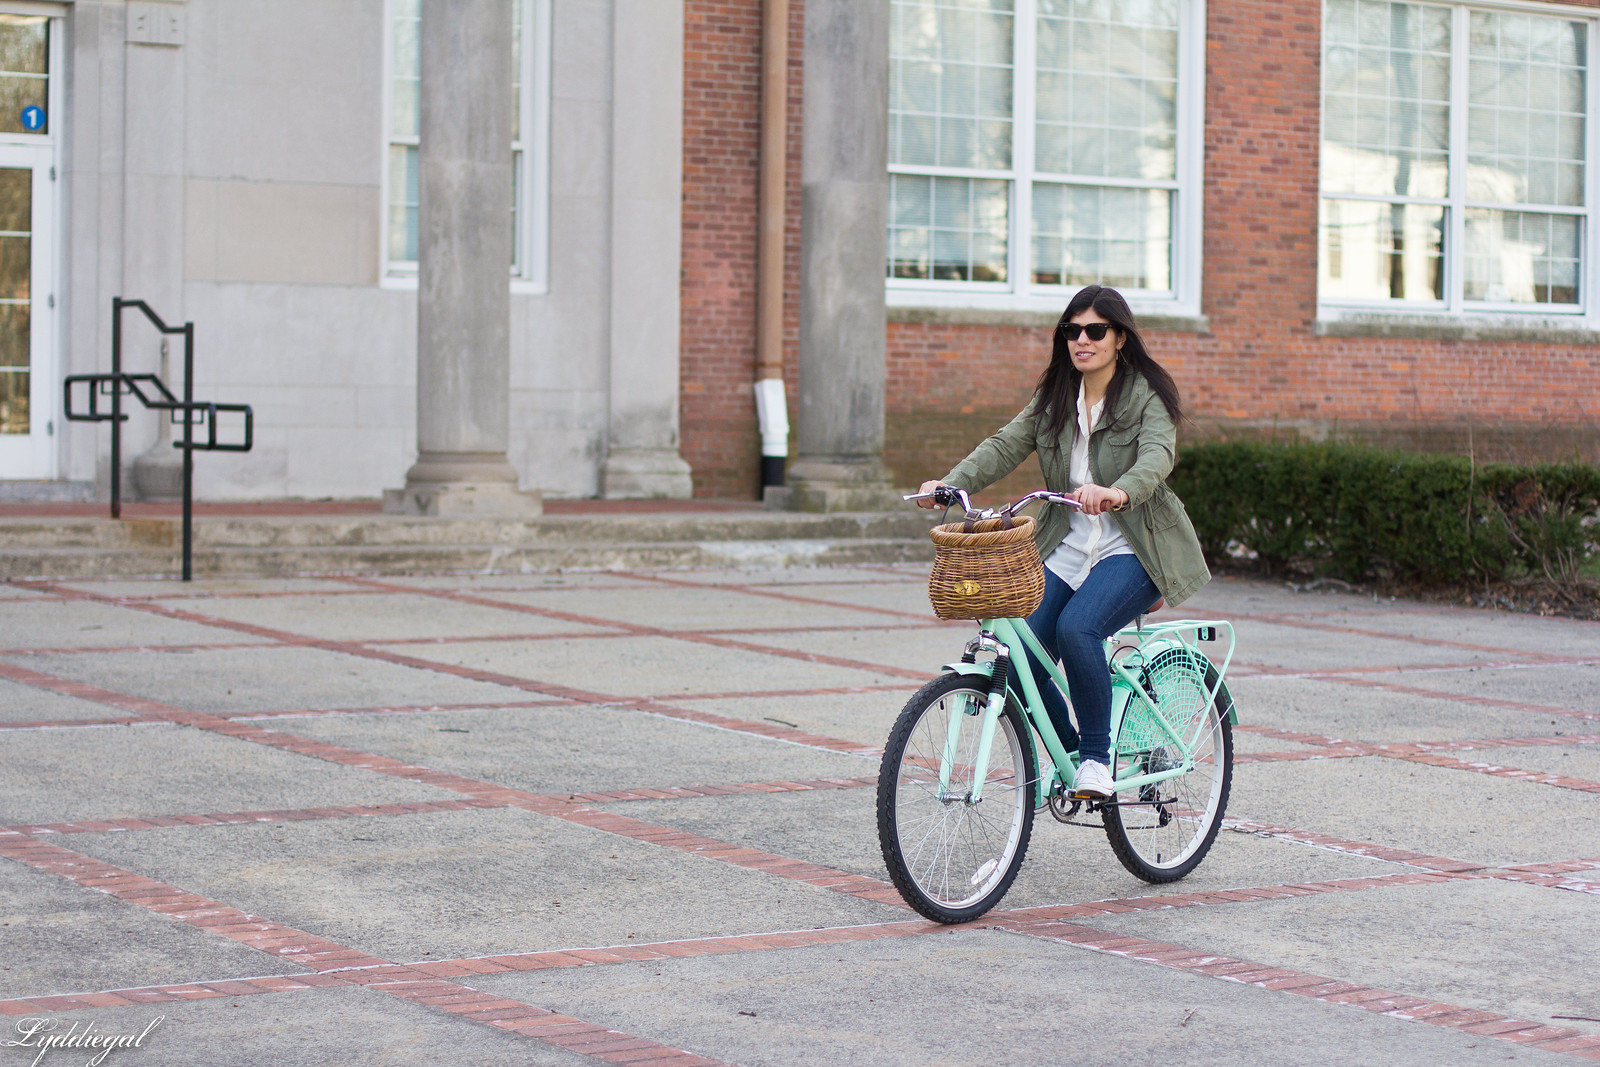 bike riding outfit, white shirt, green field jacket, white converse-4.jpg